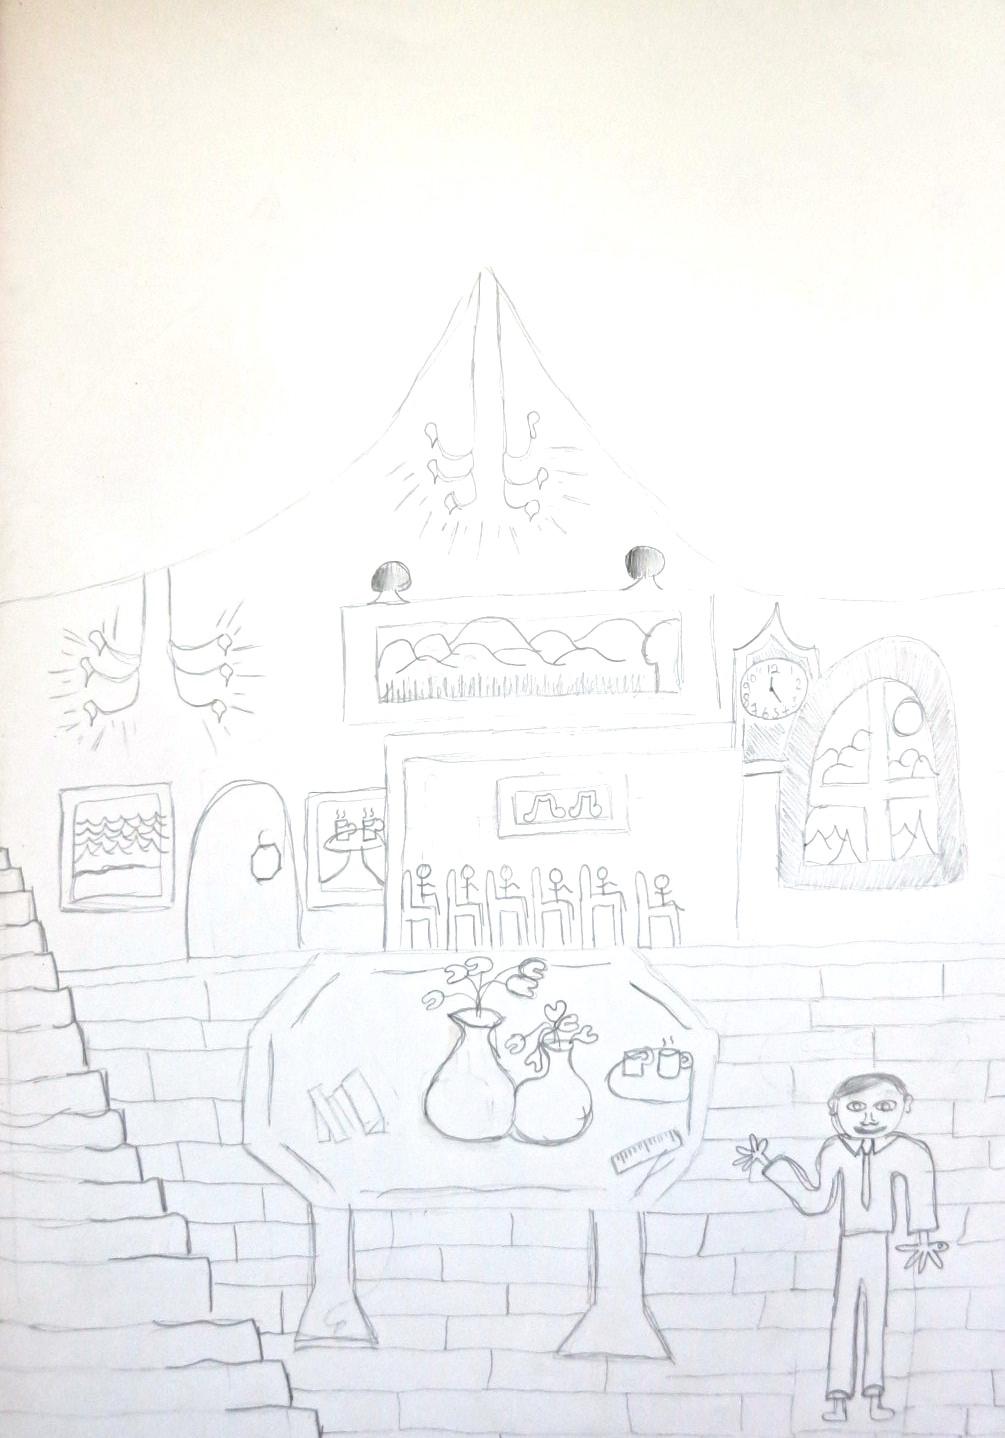 """The chandelier rains down golden light."" Illustration by Chloe M, Year 8, Sompting Abbotts Preparatory School"